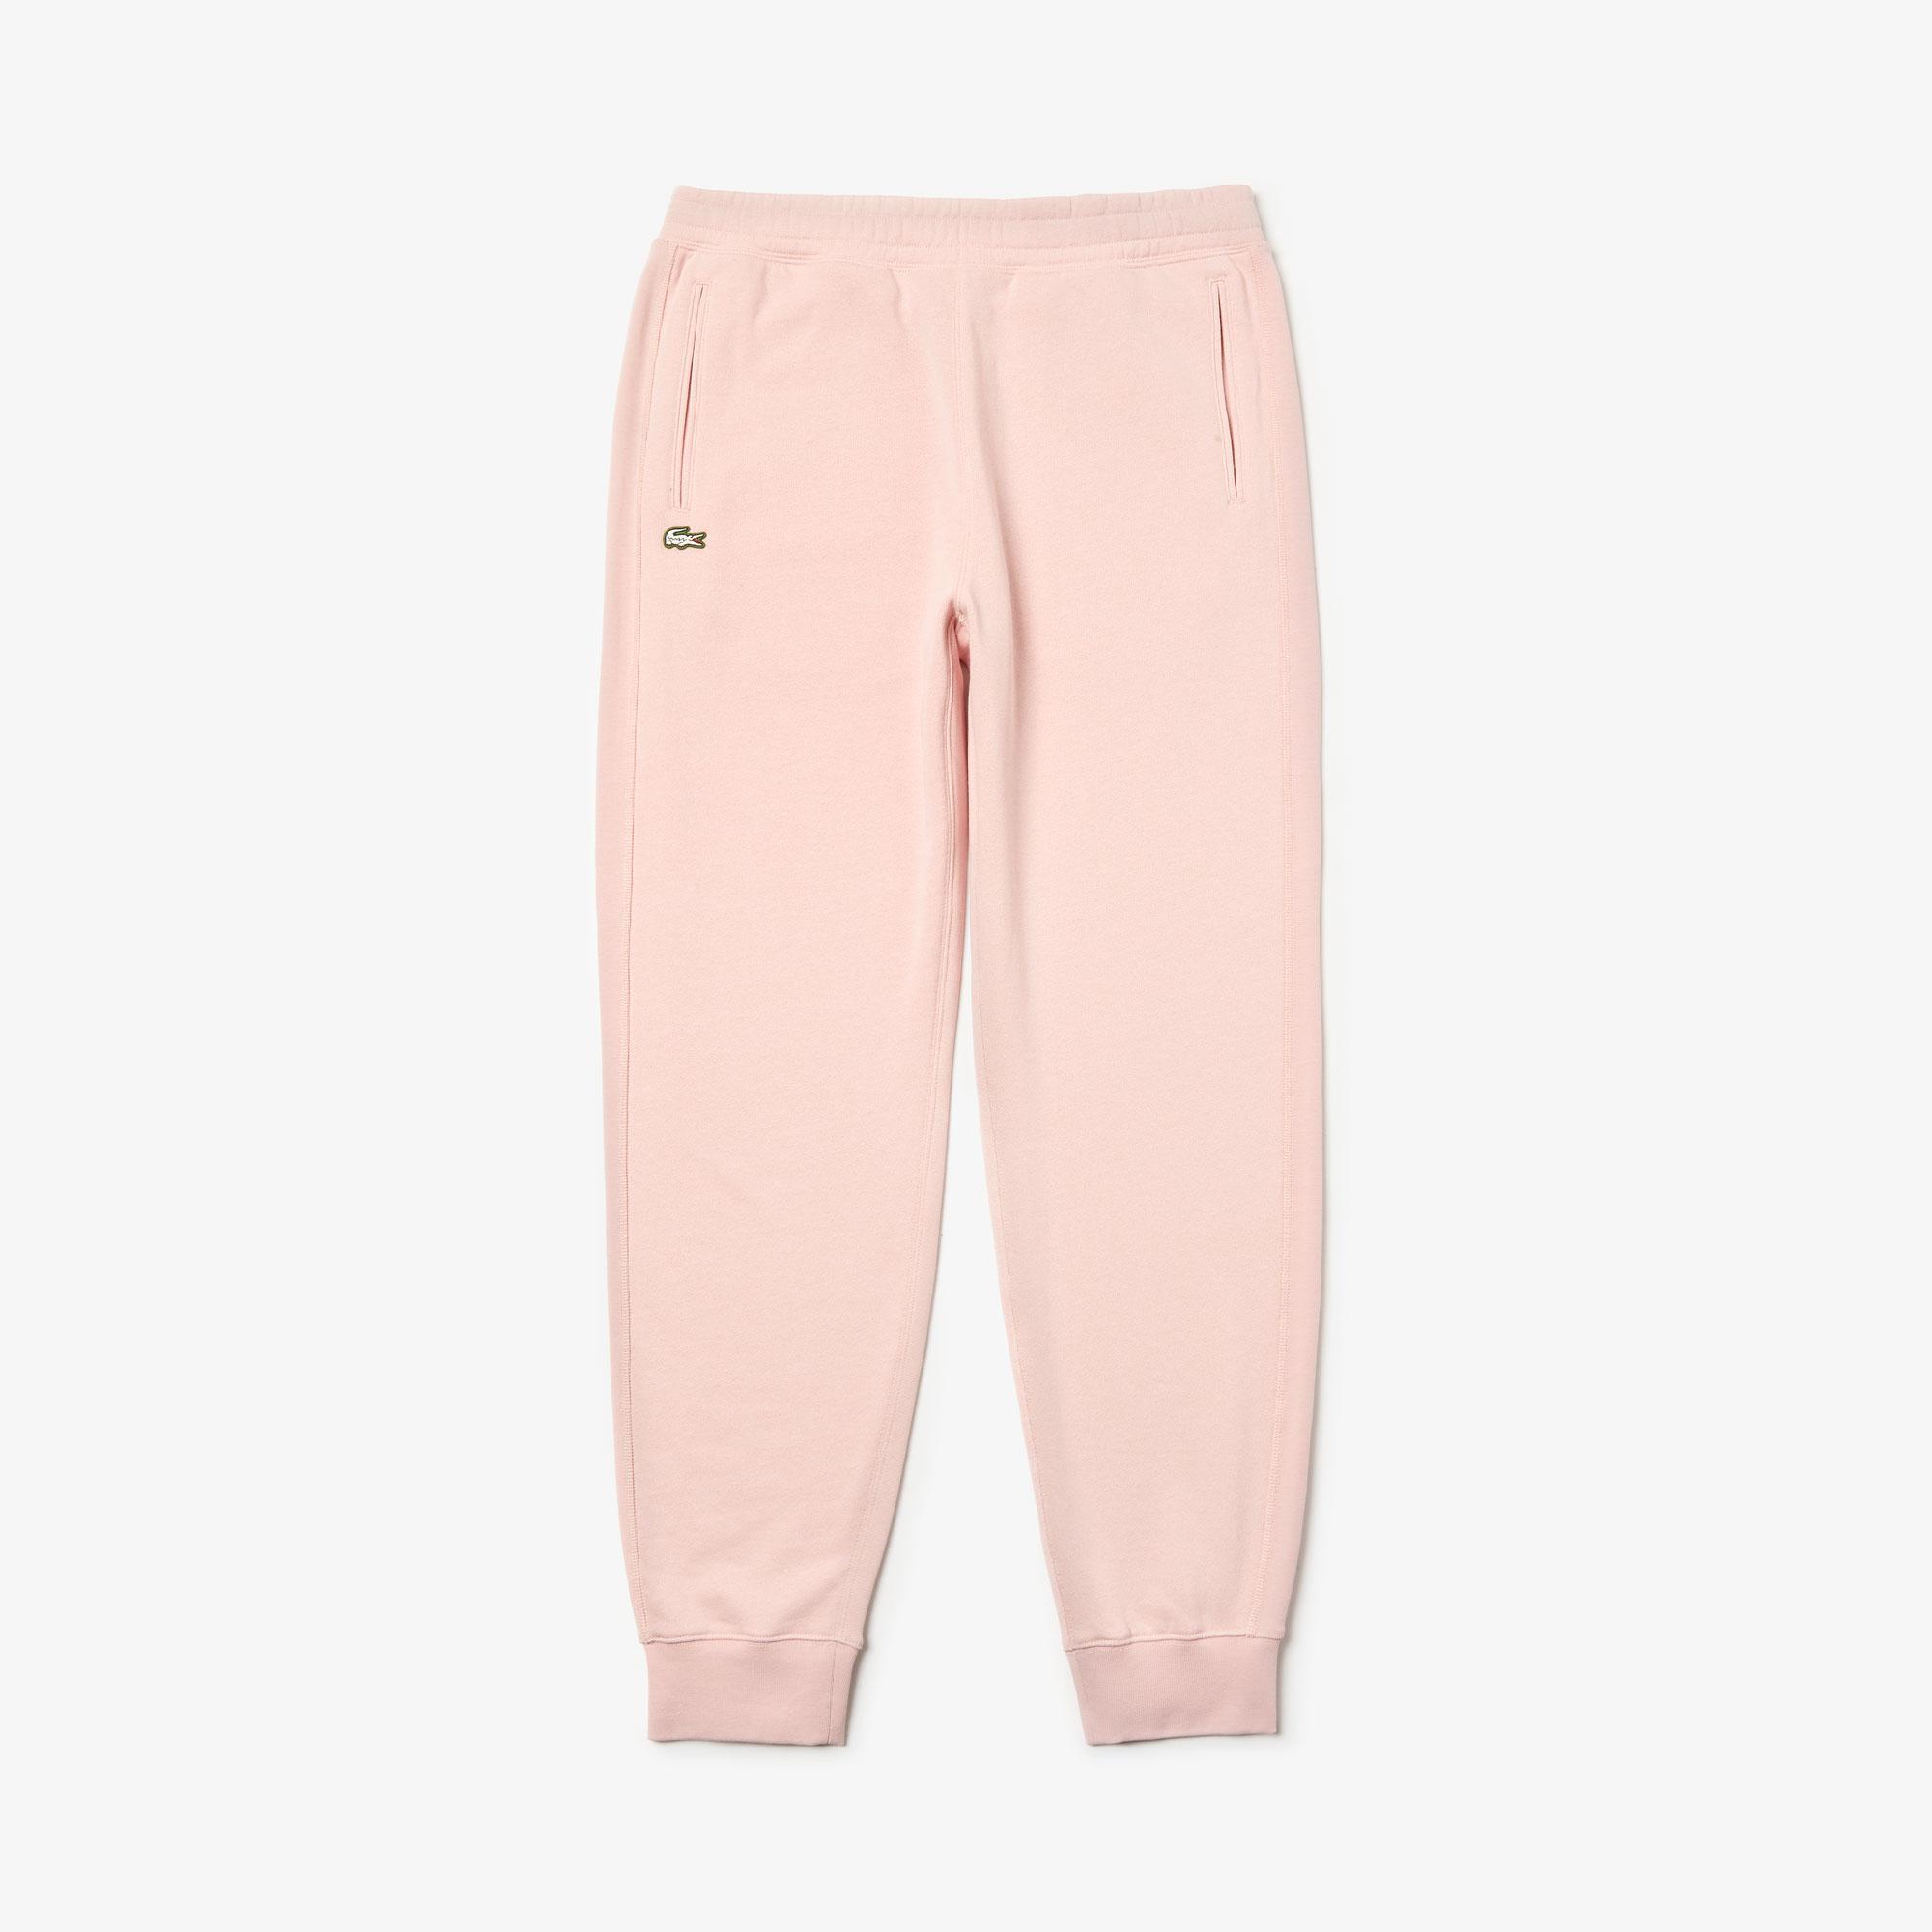 Lacoste Unisex Trousers